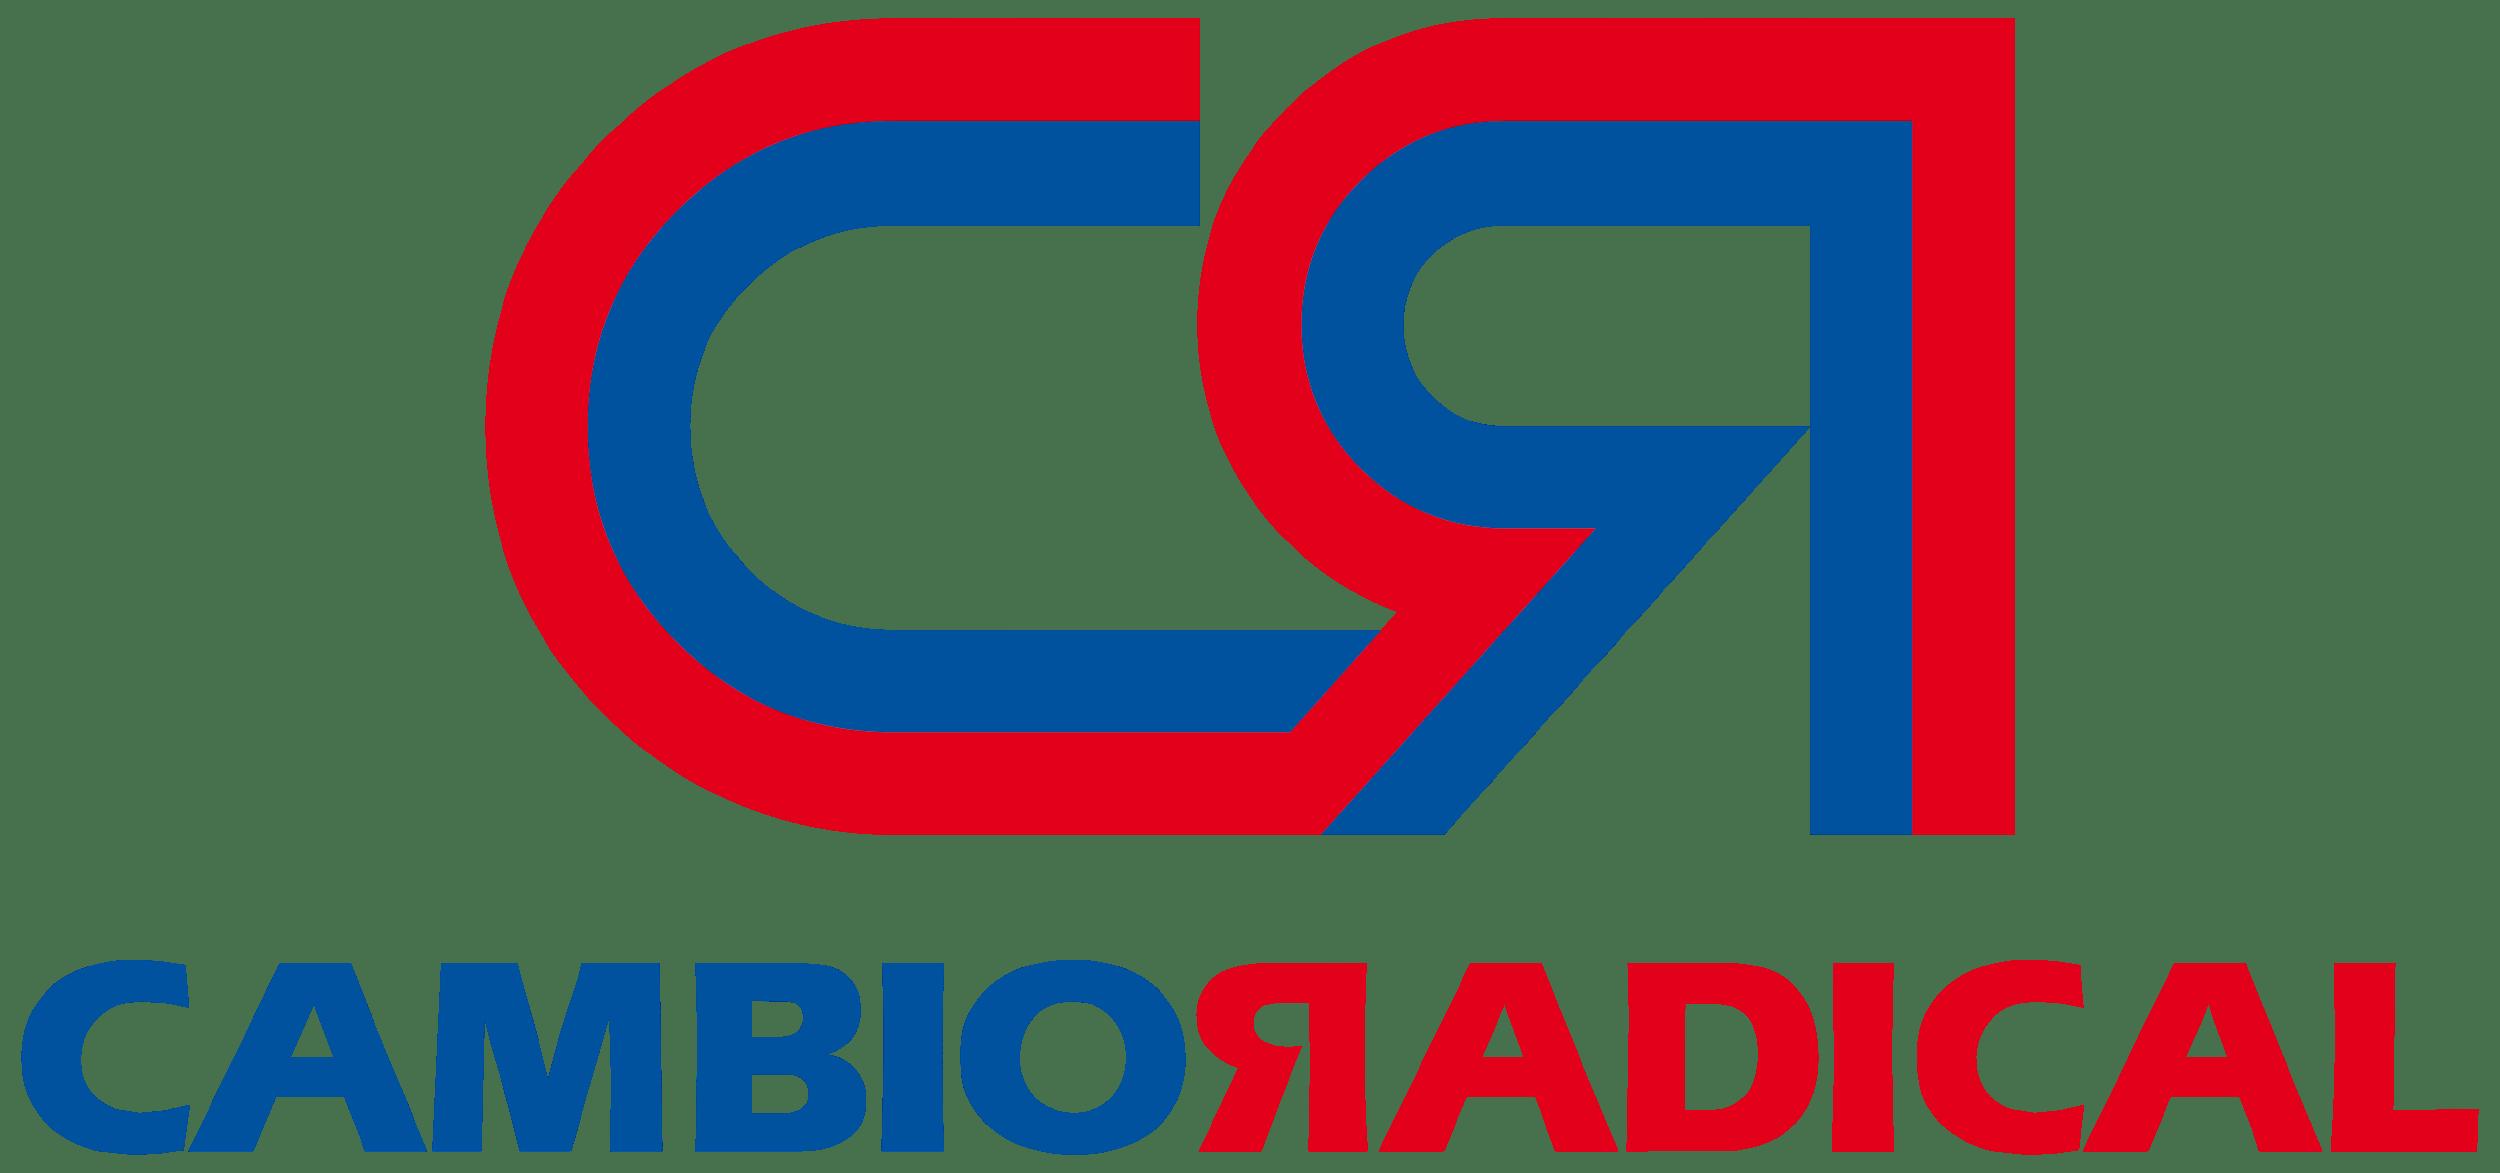 Political campaign logo - Cambio Radical